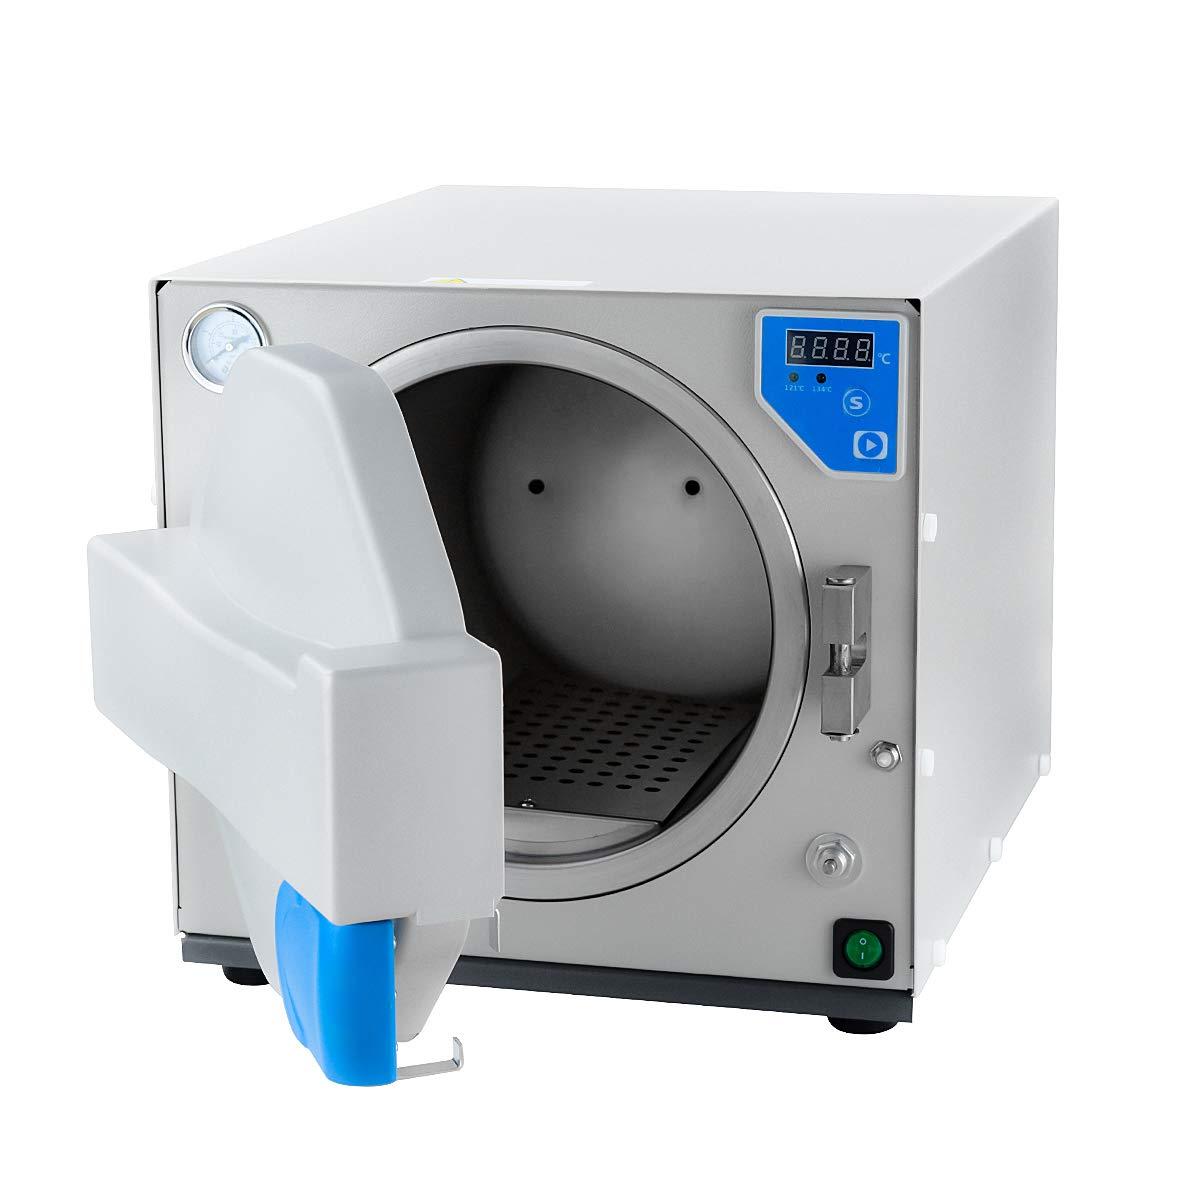 SOHOME 18L MINI320 Digital Display Autoclave Steam Lab Machine by SoHome (Image #5)